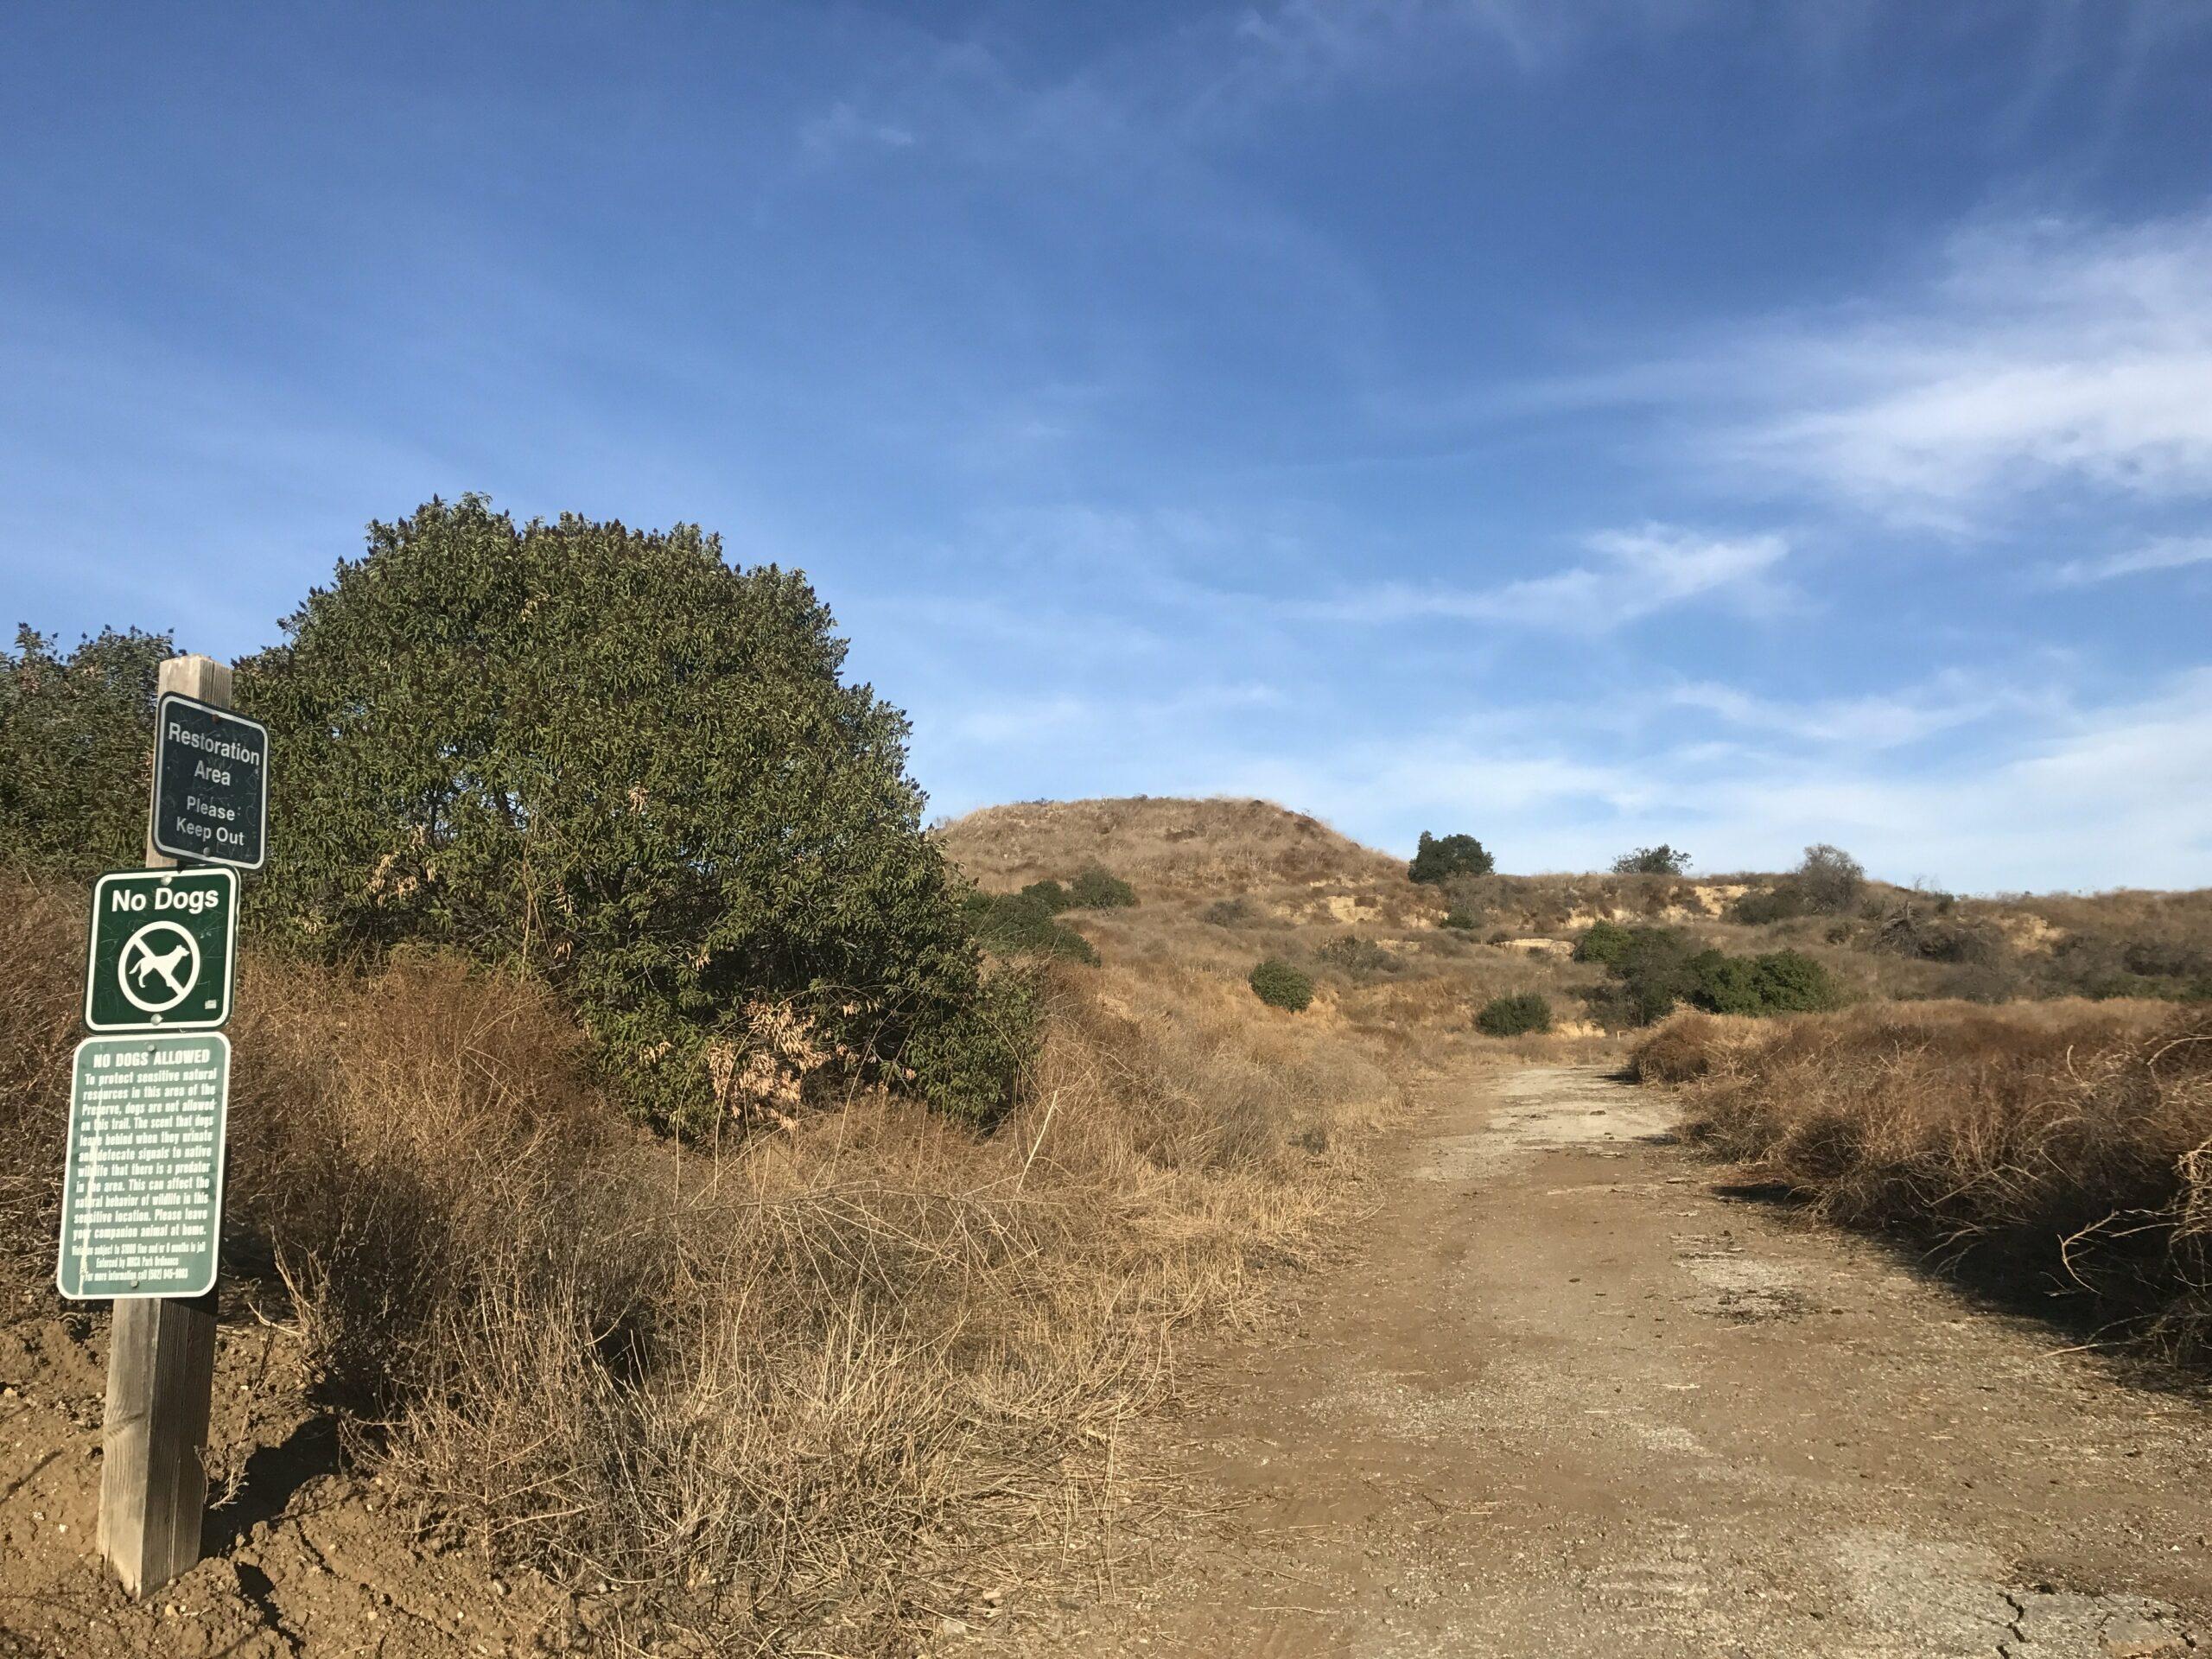 Arroyo Pescadero trail entrance